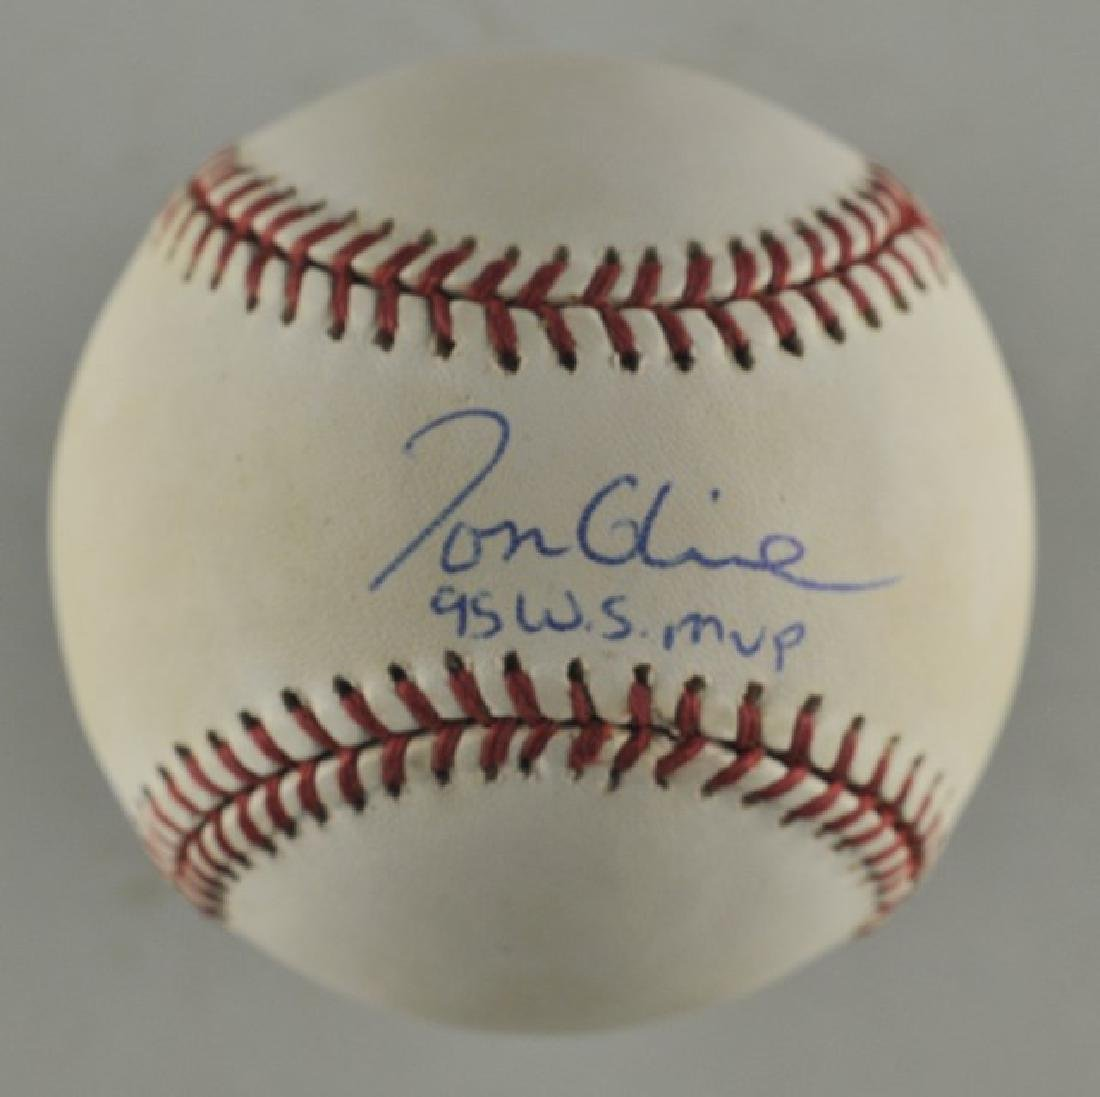 Signed Tom Glavine '95 WS MVP Baseball